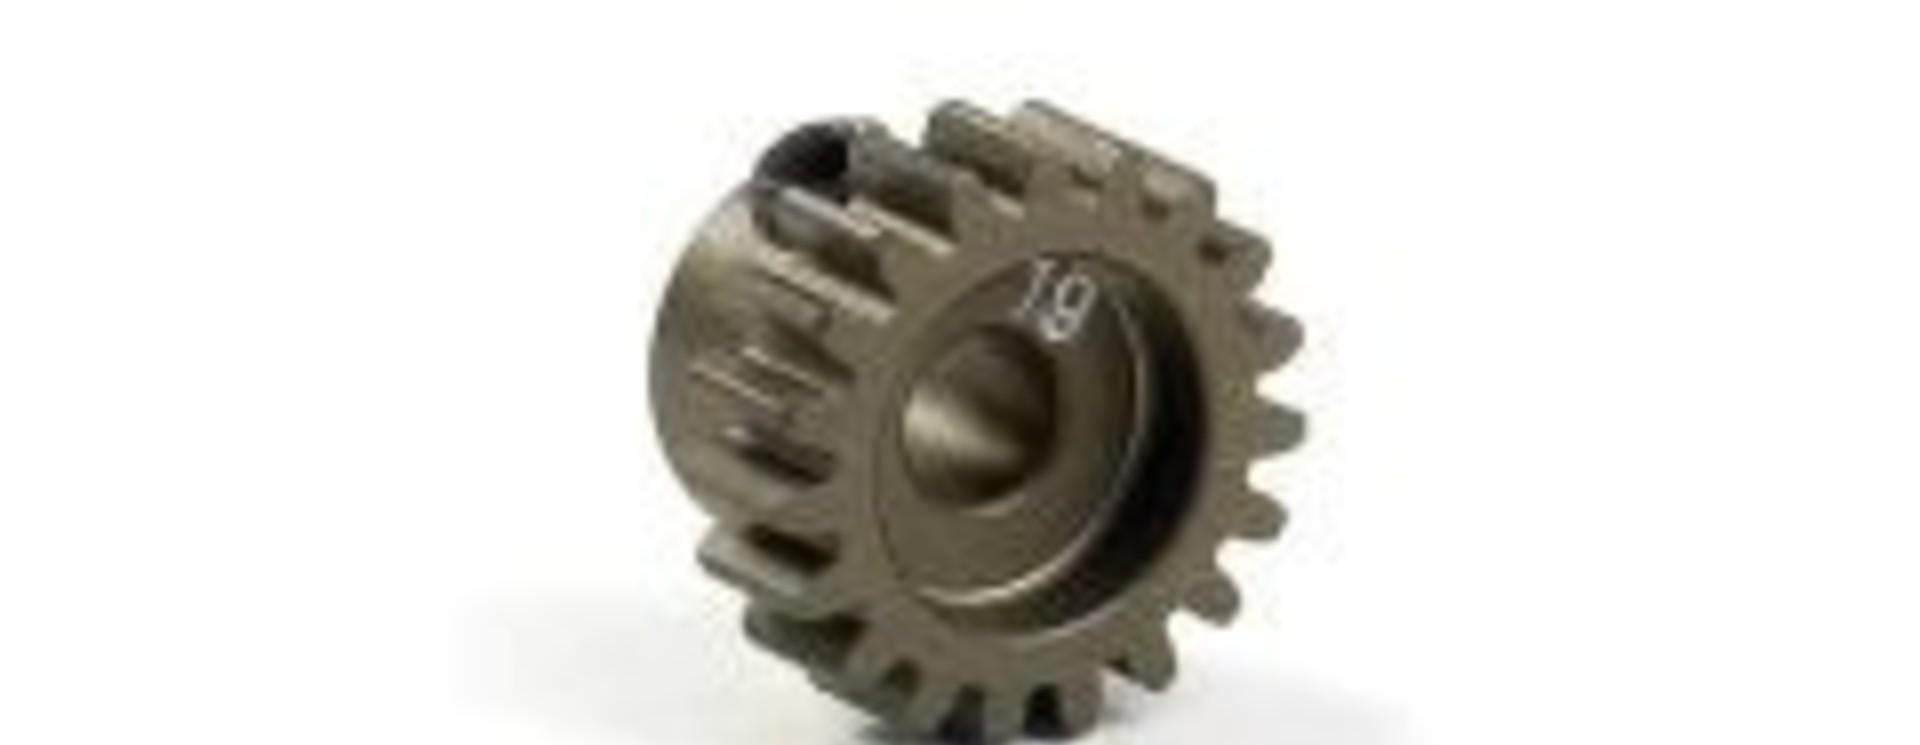 MOD1 5mm